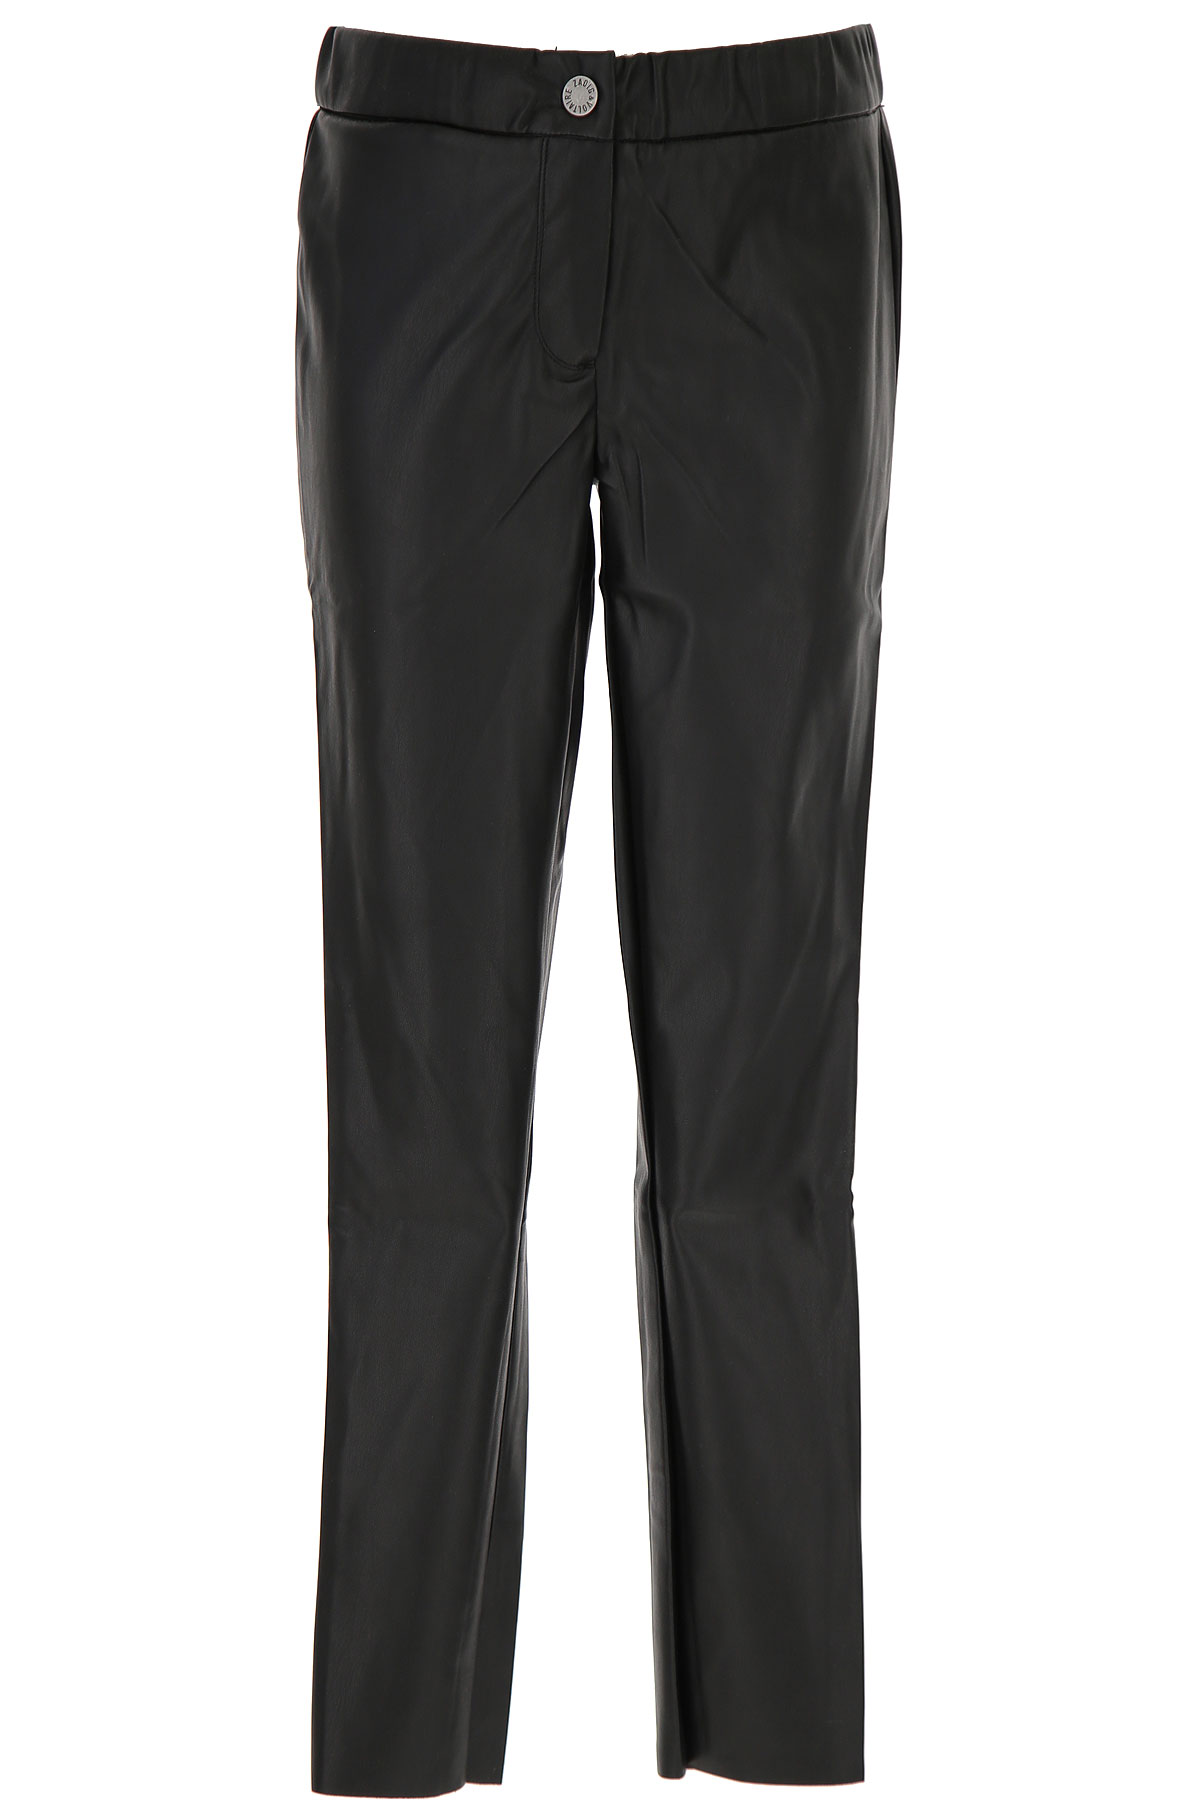 Zadig & Voltaire Kids Pants for Girls On Sale, Black, polyester, 2019, 10Y 12Y 14Y 16Y 8Y